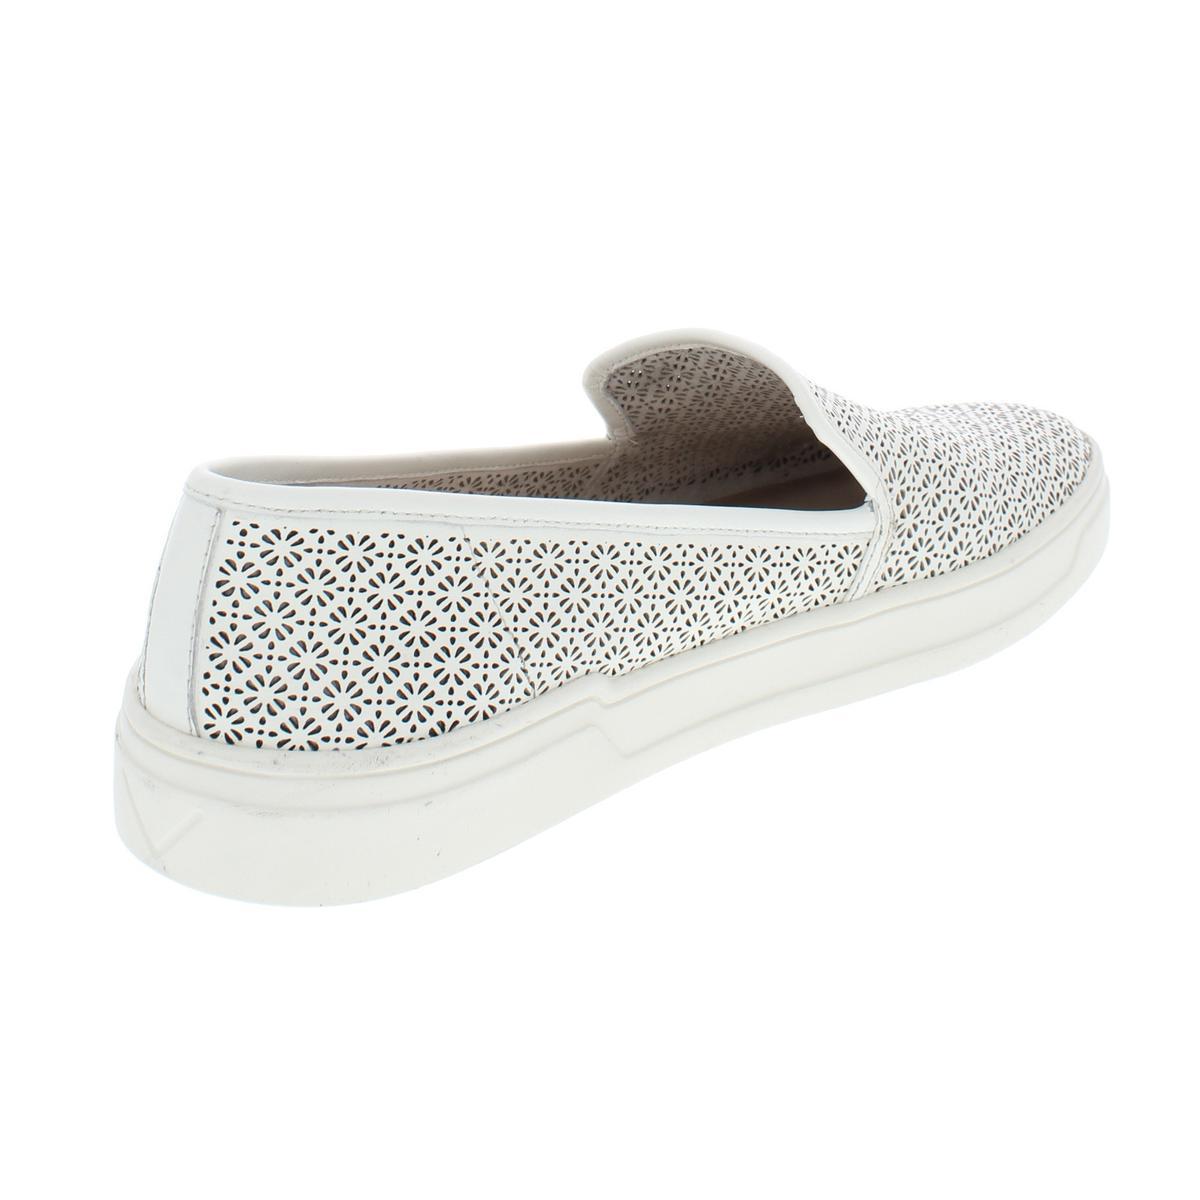 Via-Spiga-Womens-Gianna-Metallic-Leather-Low-Top-Casual-Shoes-Flats-BHFO-6813 thumbnail 4